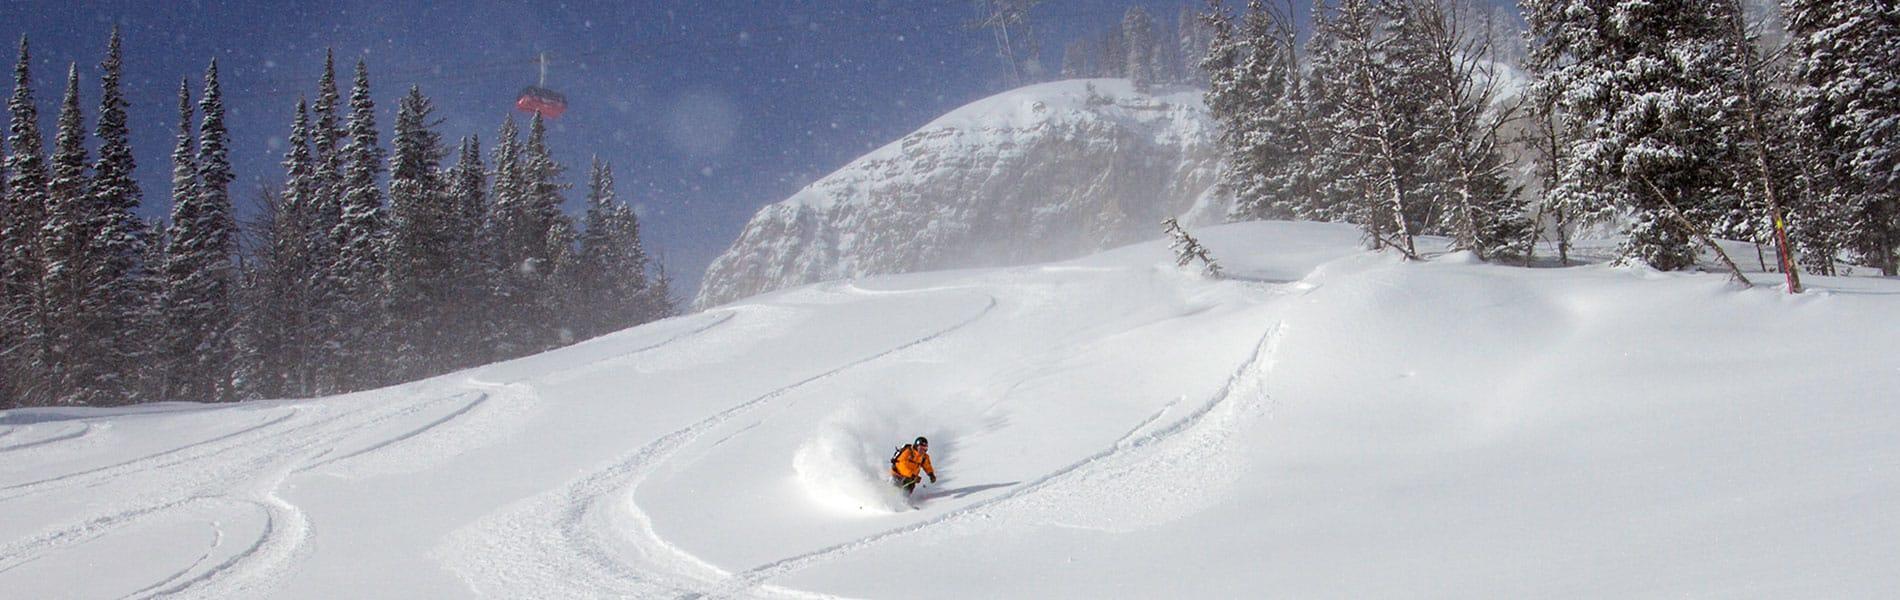 Fresh powder skiing in Jackson Hole